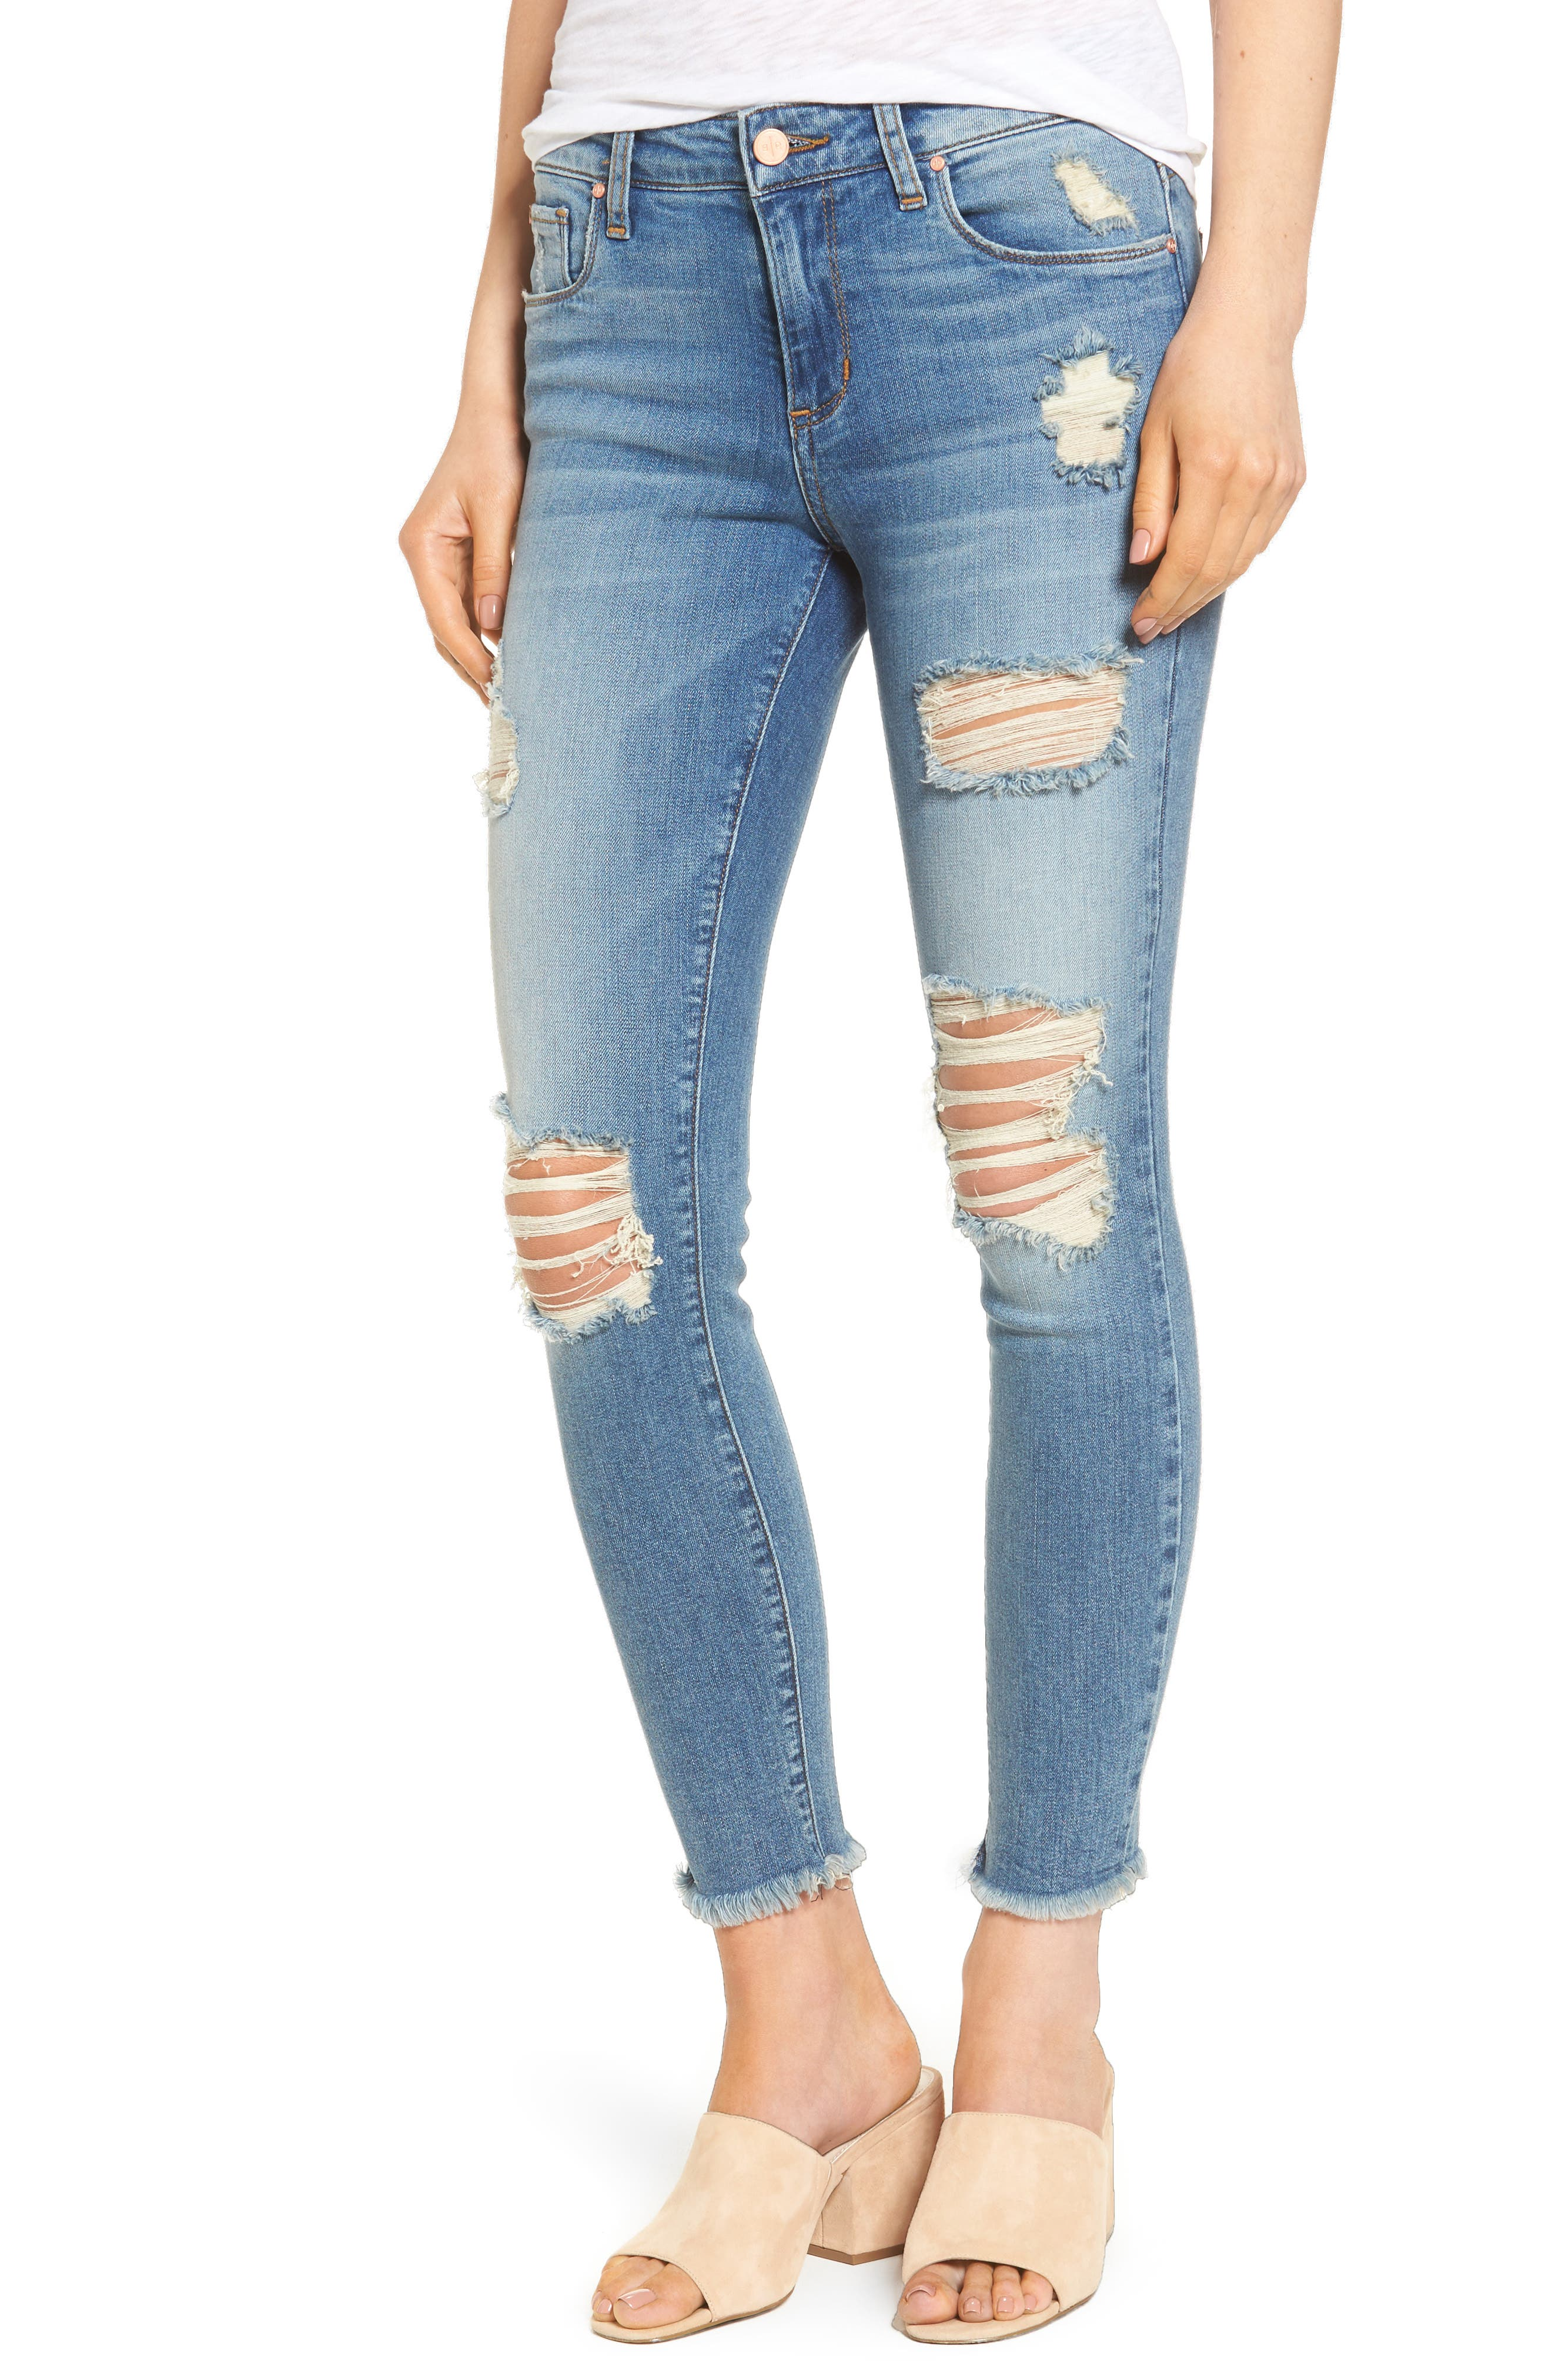 Alternate Image 1 Selected - BP. Ripped Crop Skinny Jeans